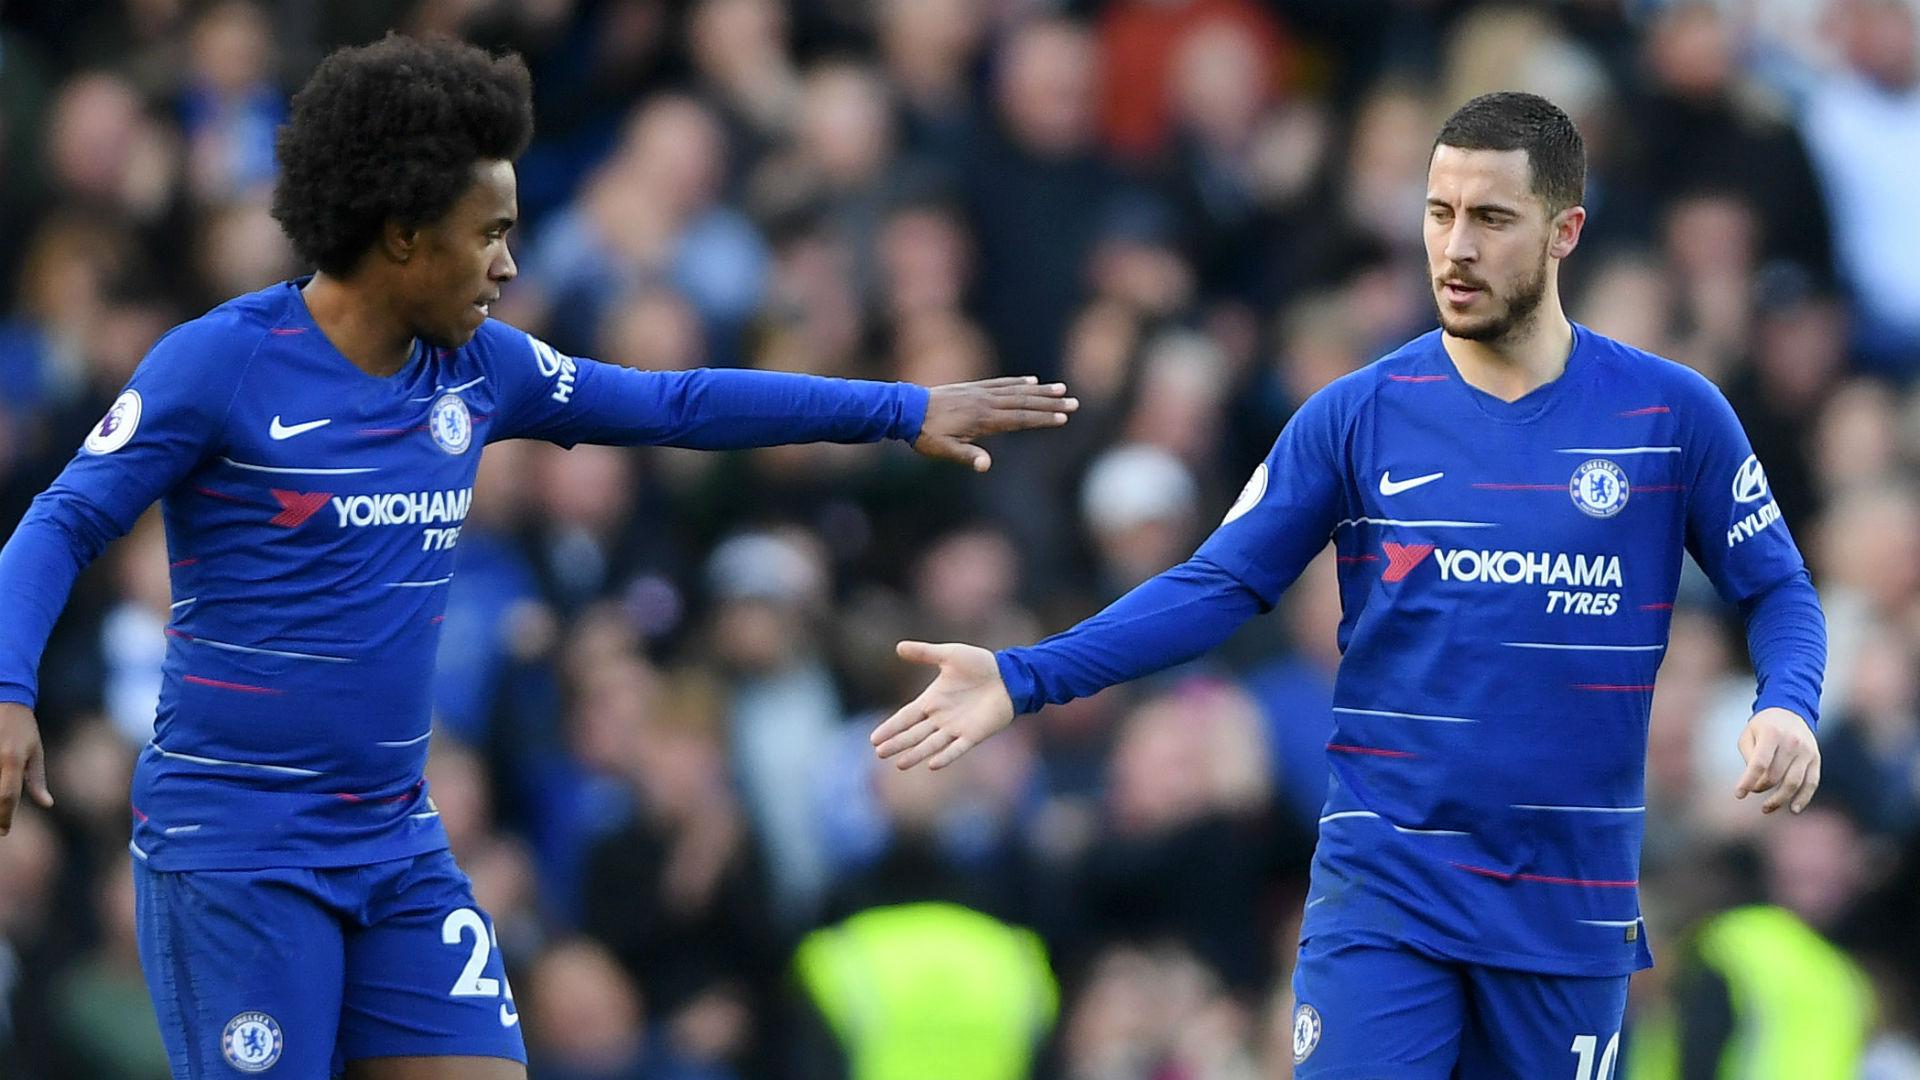 Chelsea 1 Wolves 1: Eden Hazard Half-century Sees Him Join